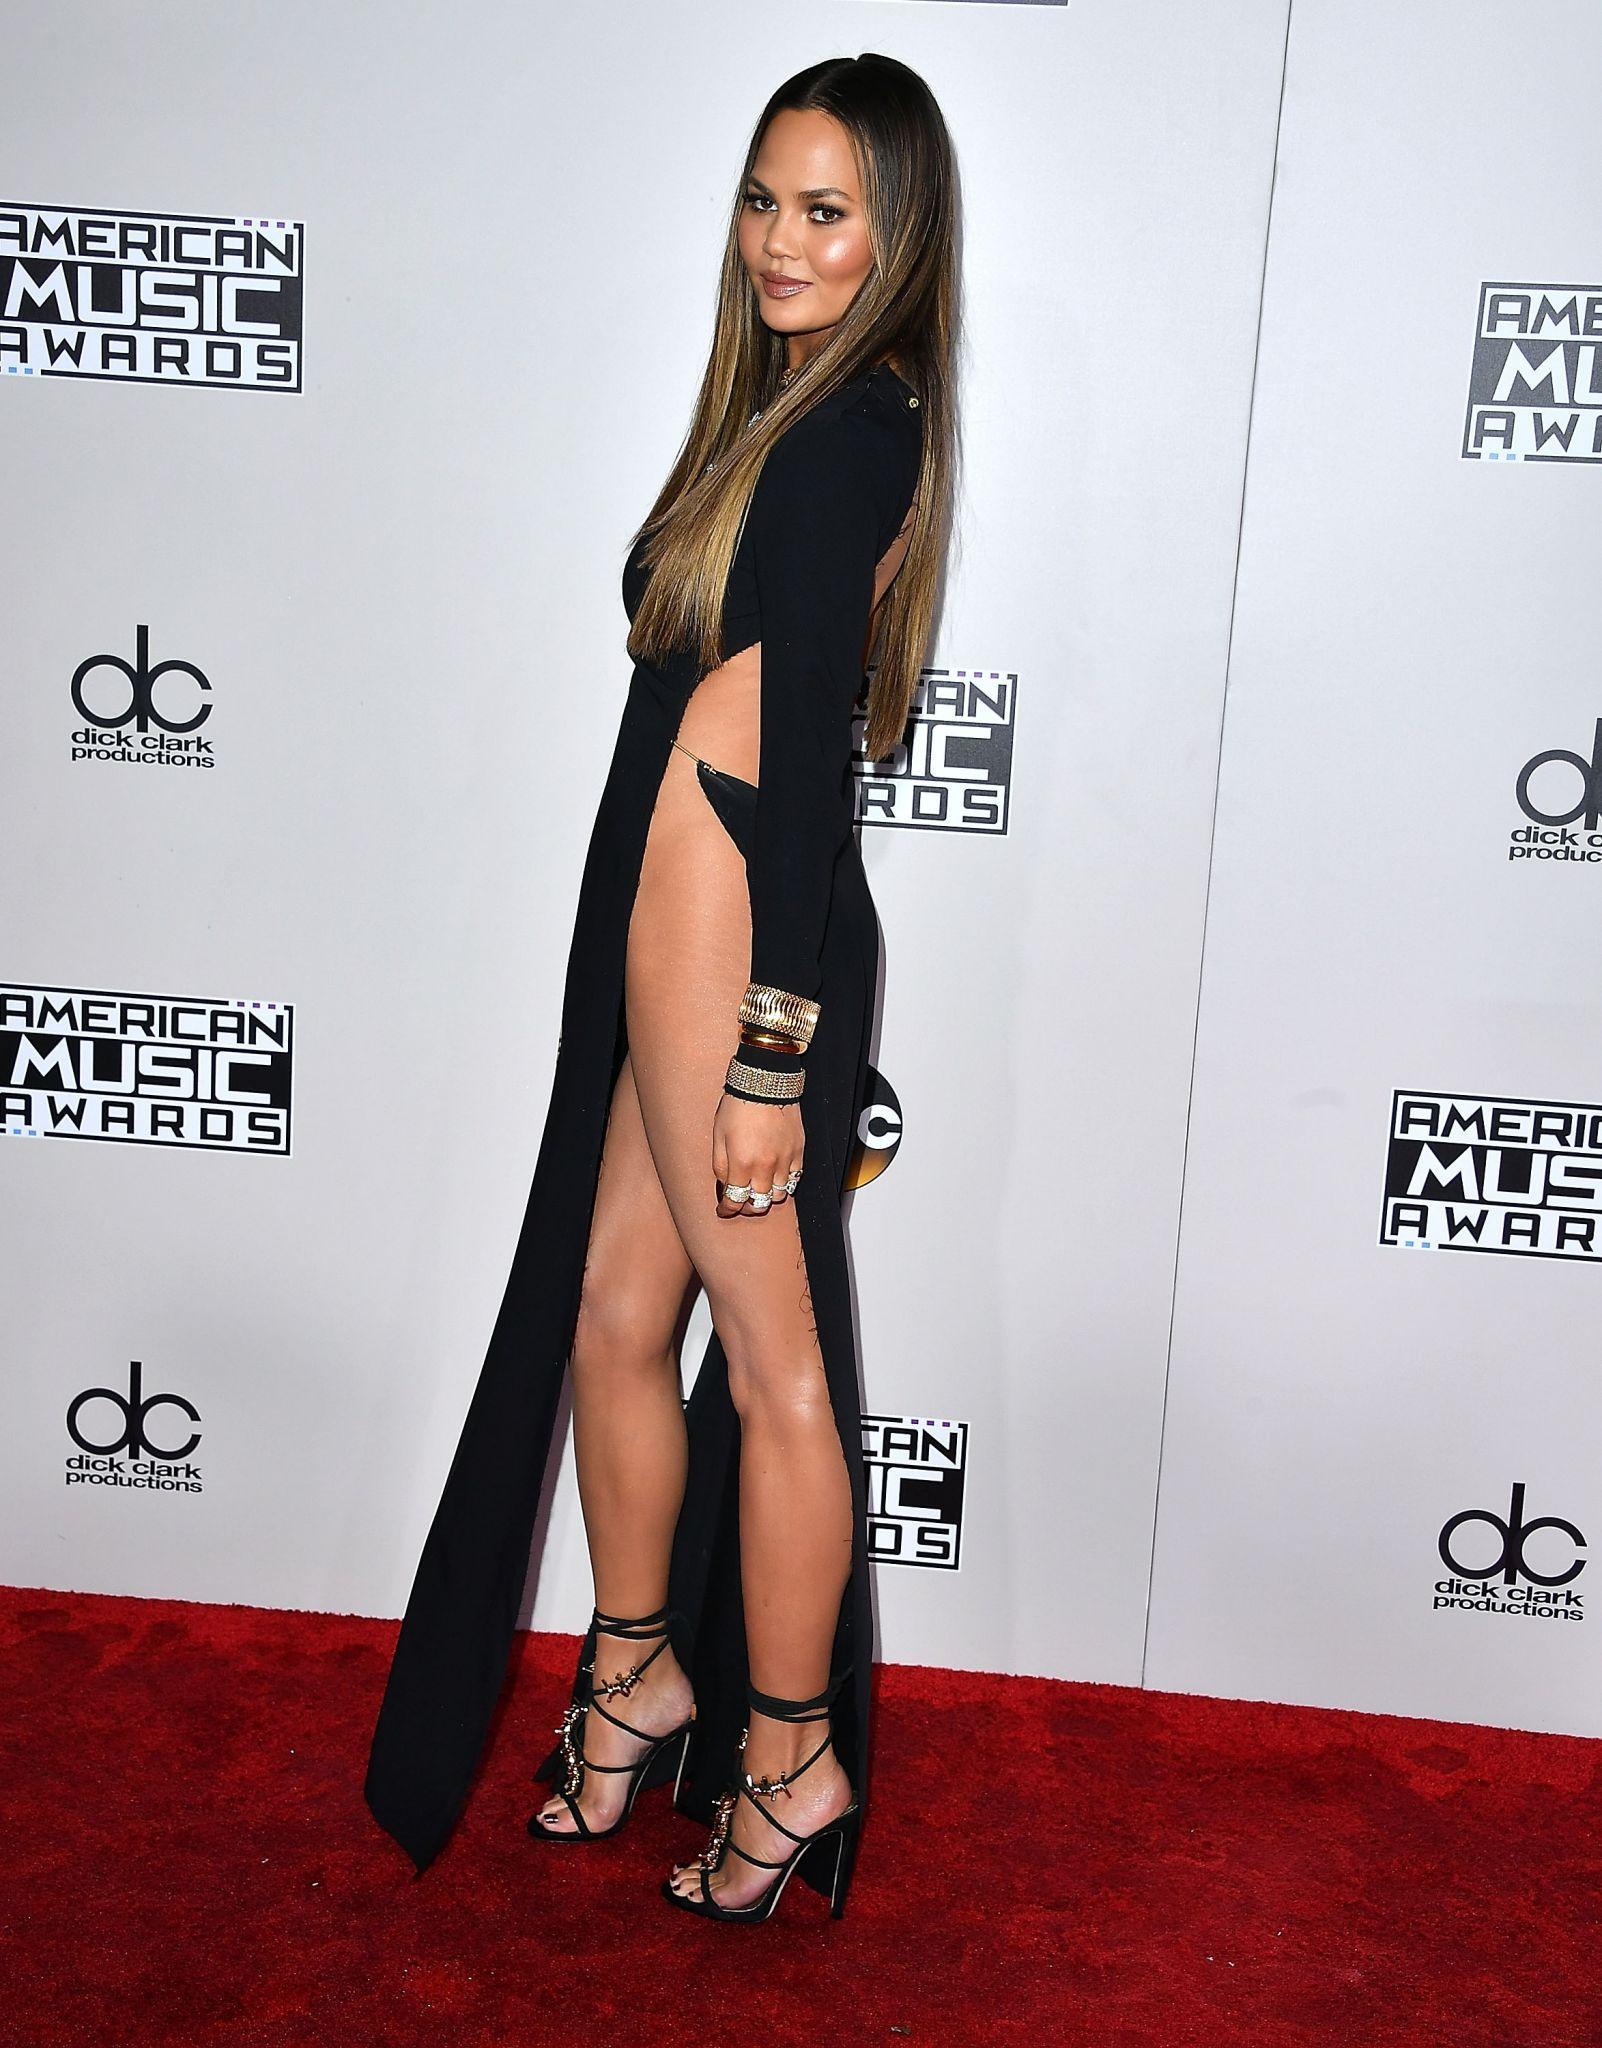 Chrissy Teigen naked dress: Is full frontal nudity next